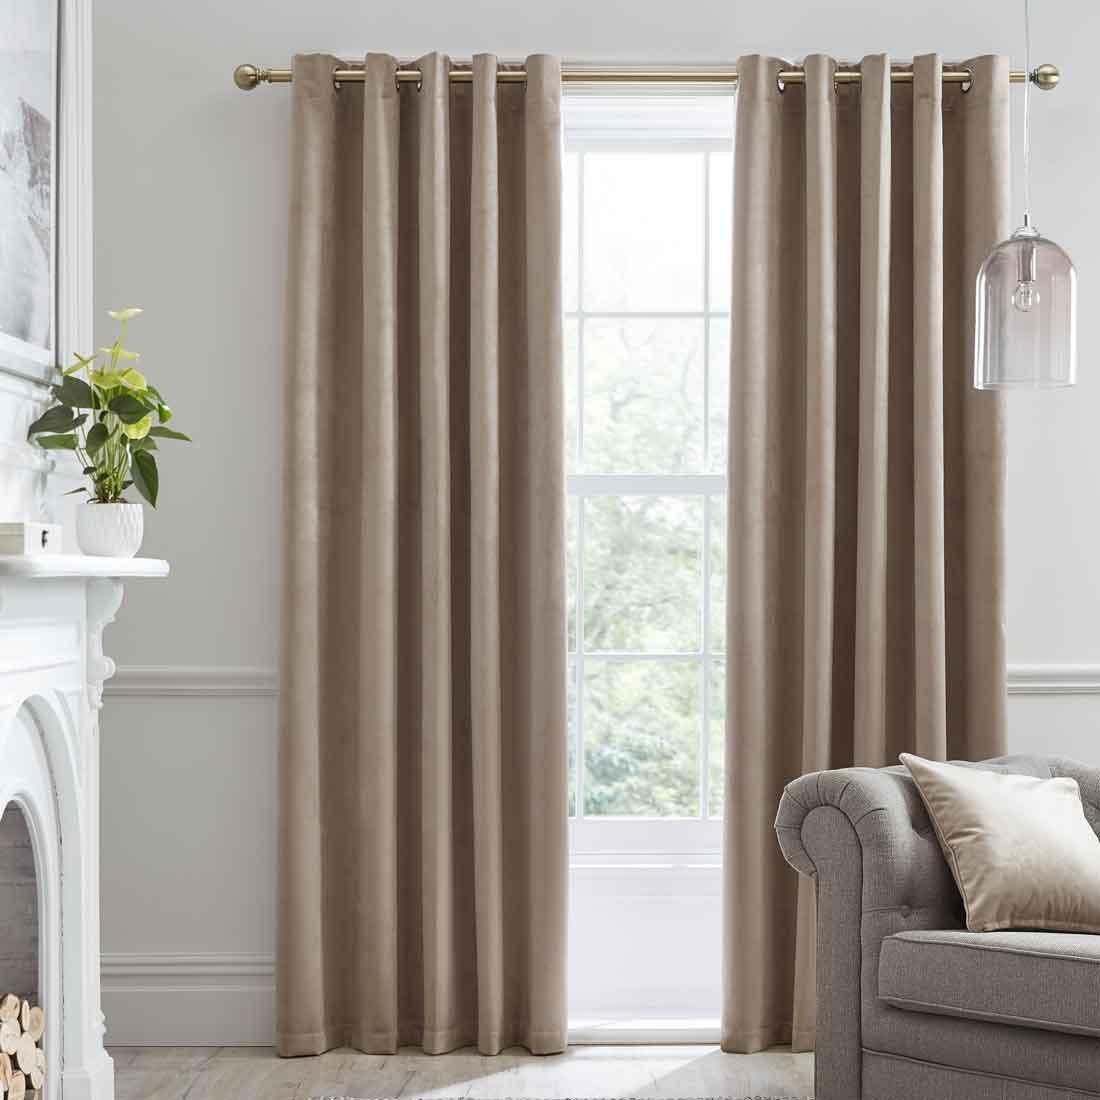 Montrose Linen Blackout Eyelet Curtains